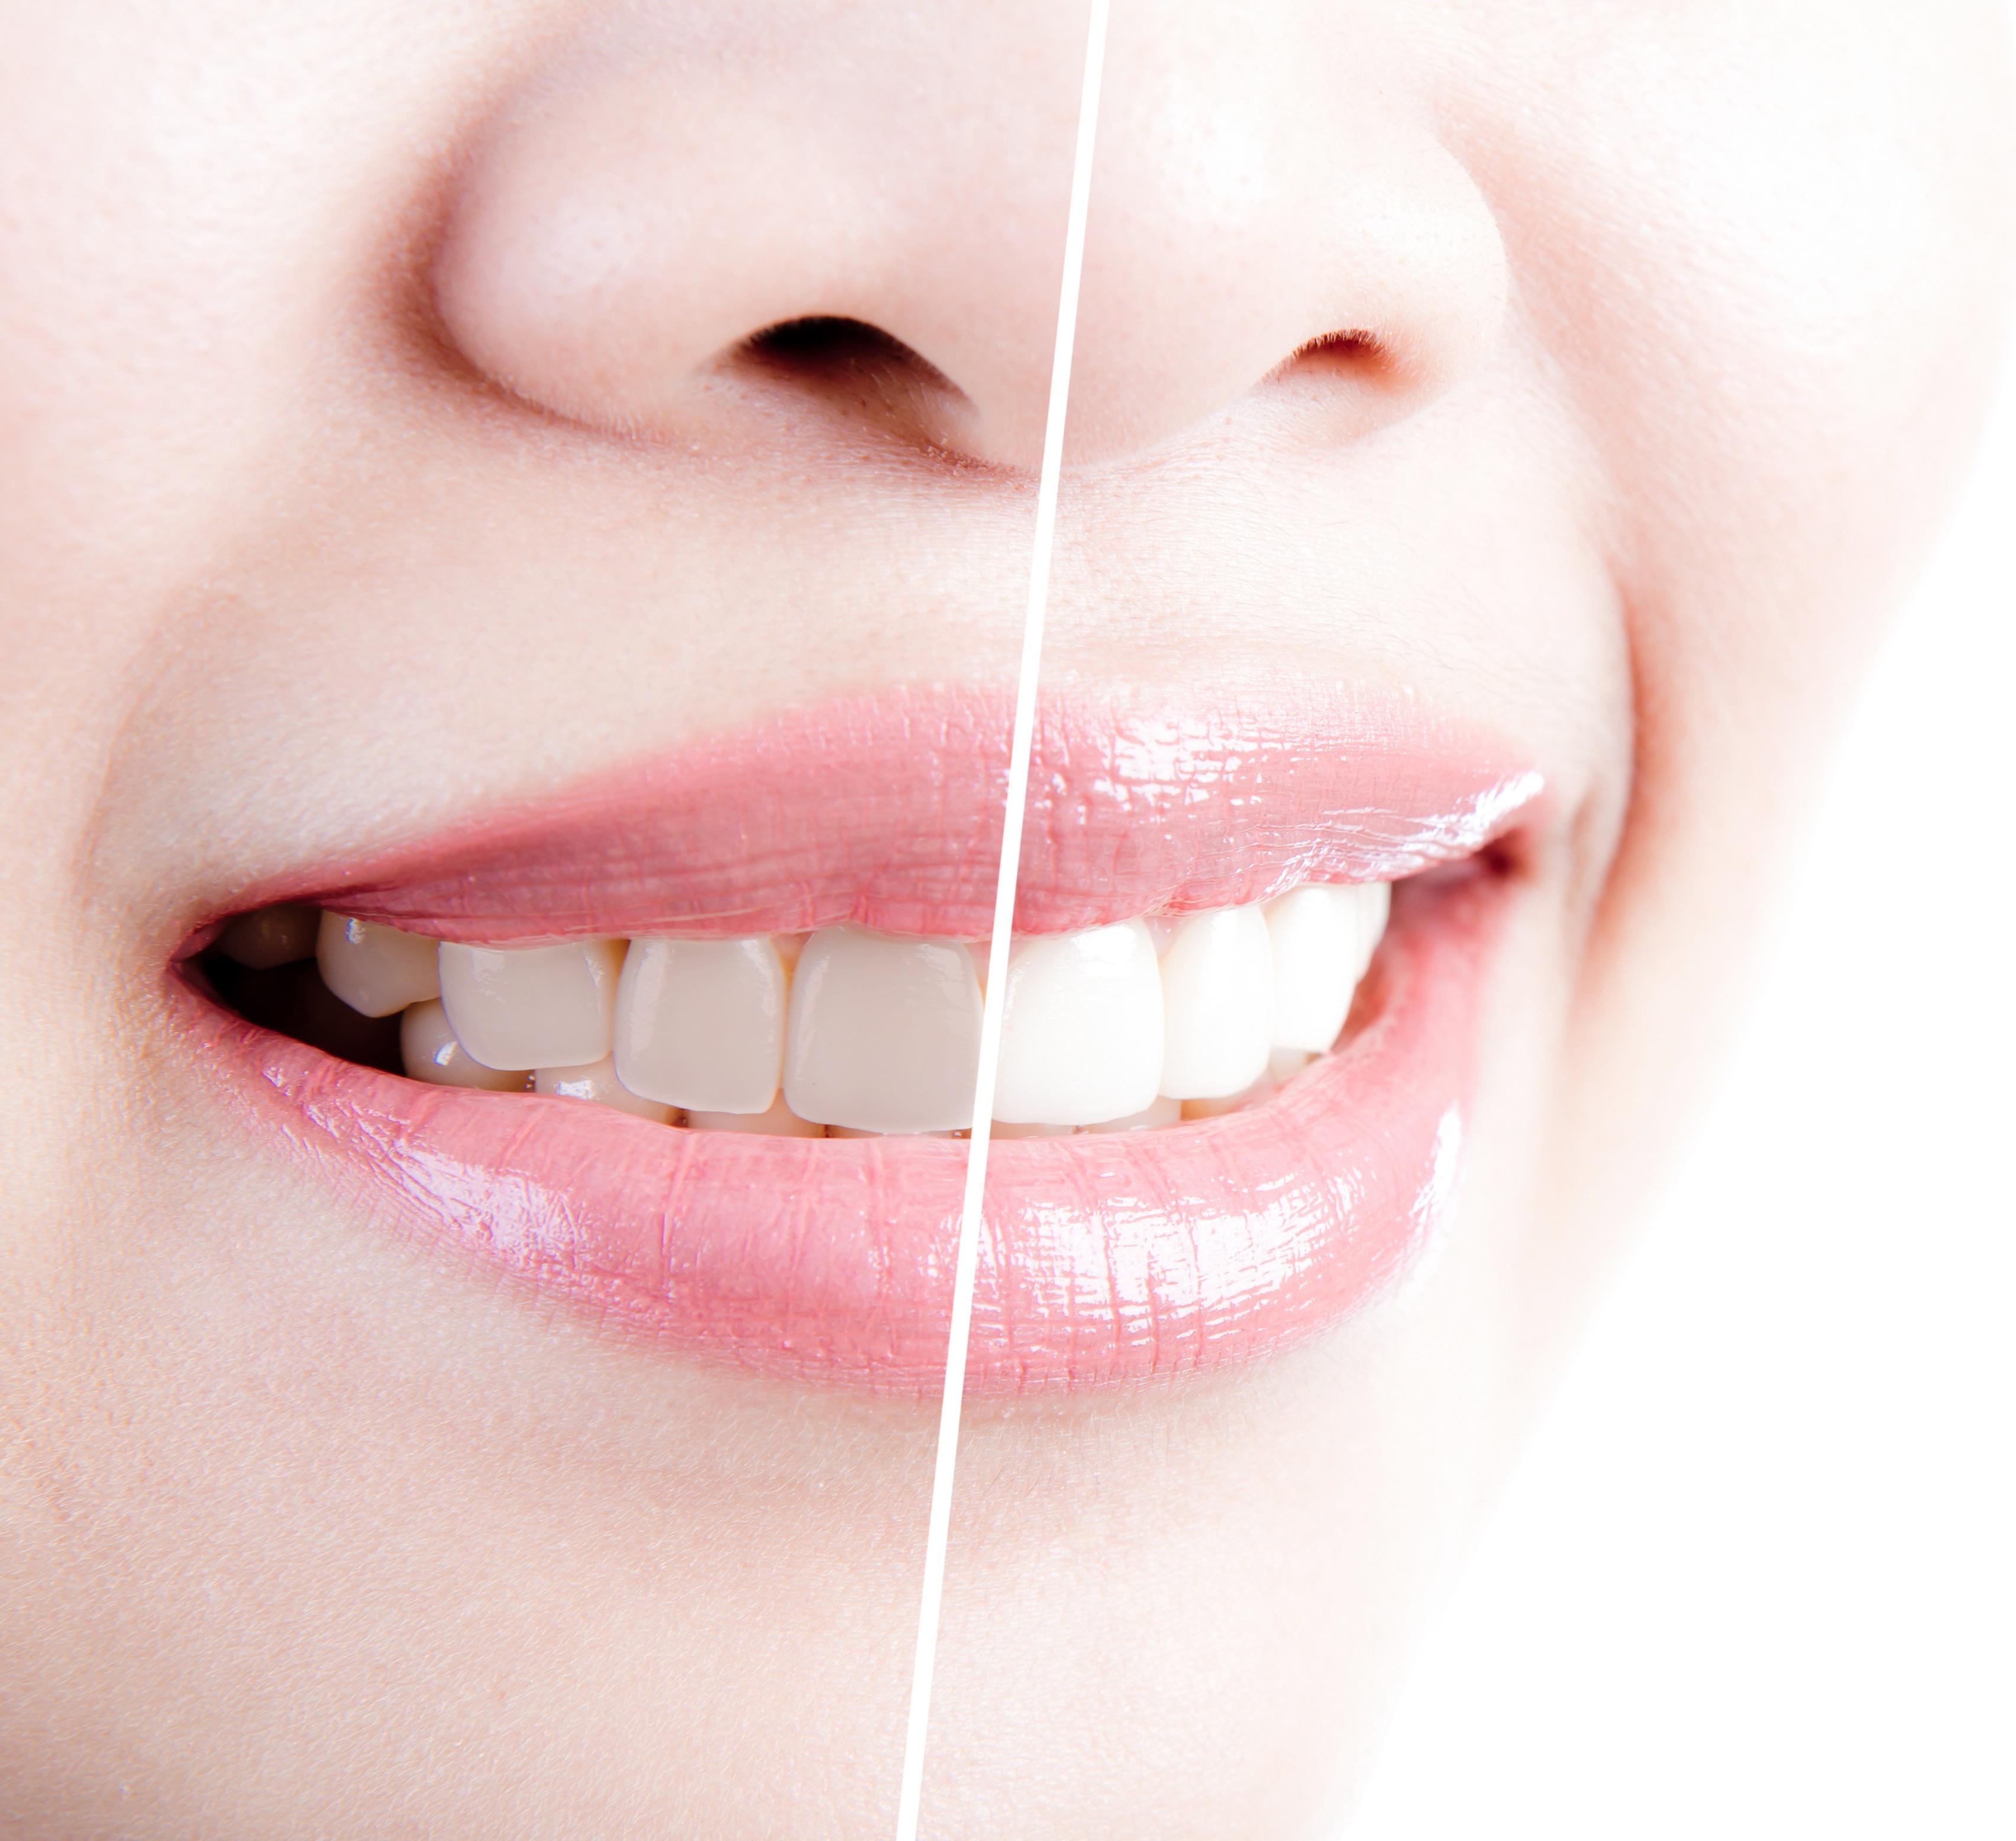 Teeth Whitening in Suffern